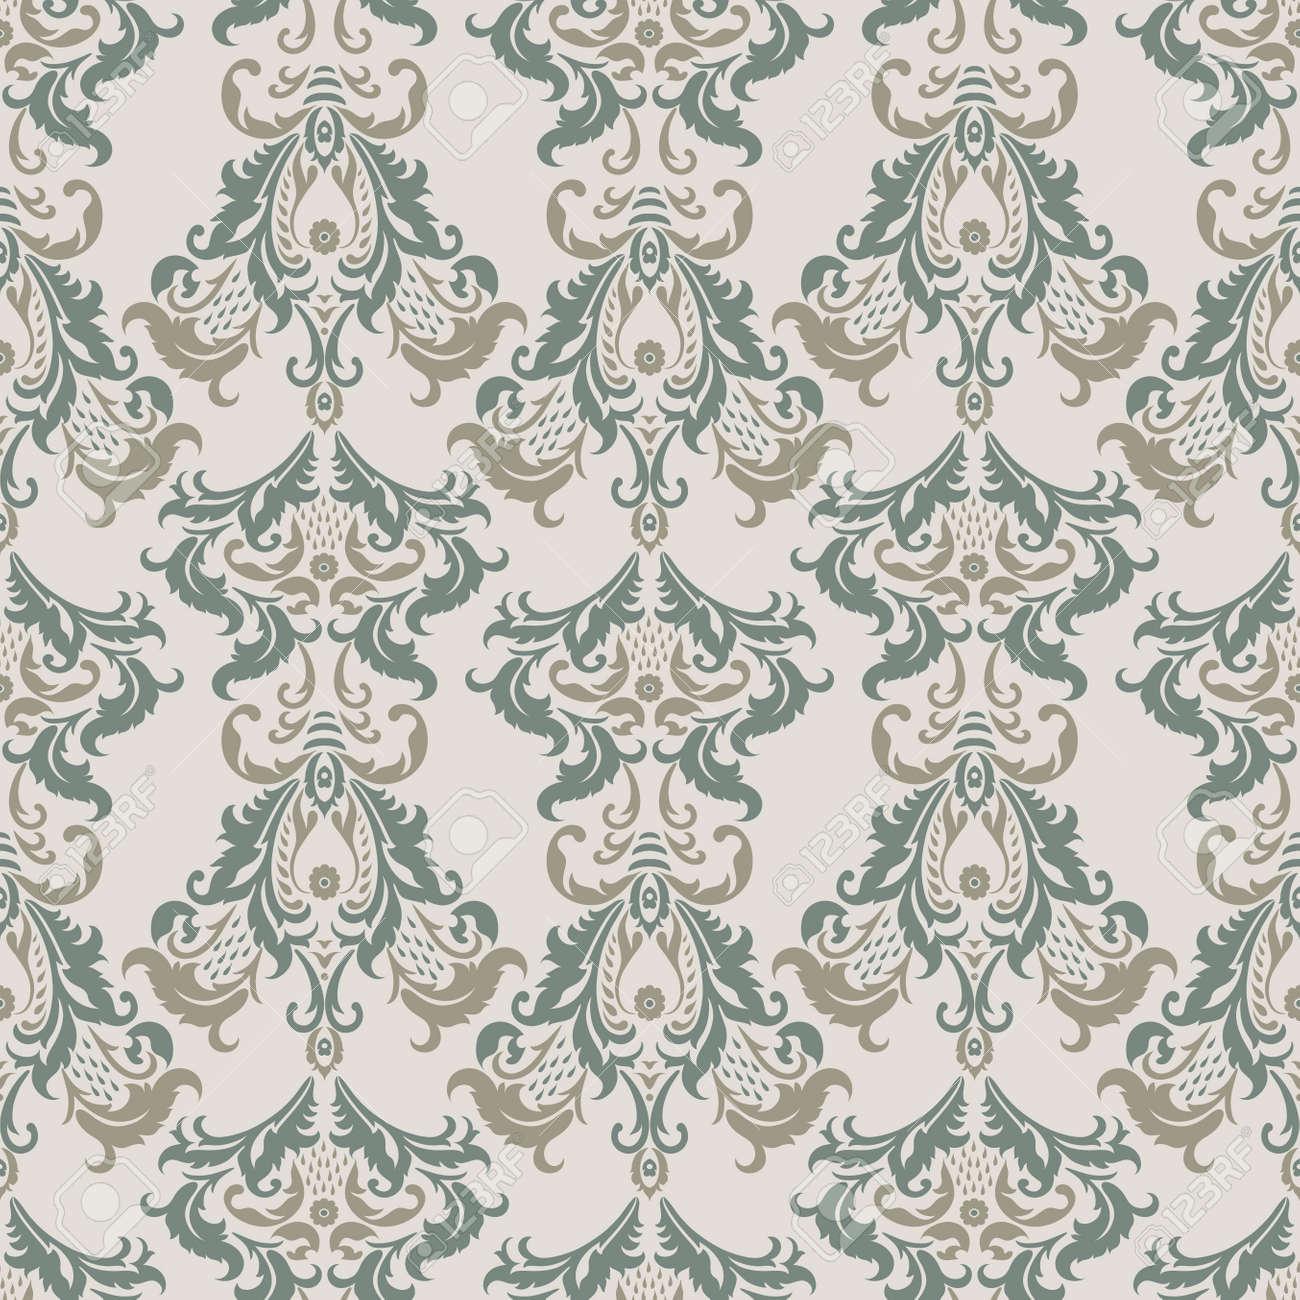 Vector Baroque Floral Pattern Classic Floral Ornament Vintage